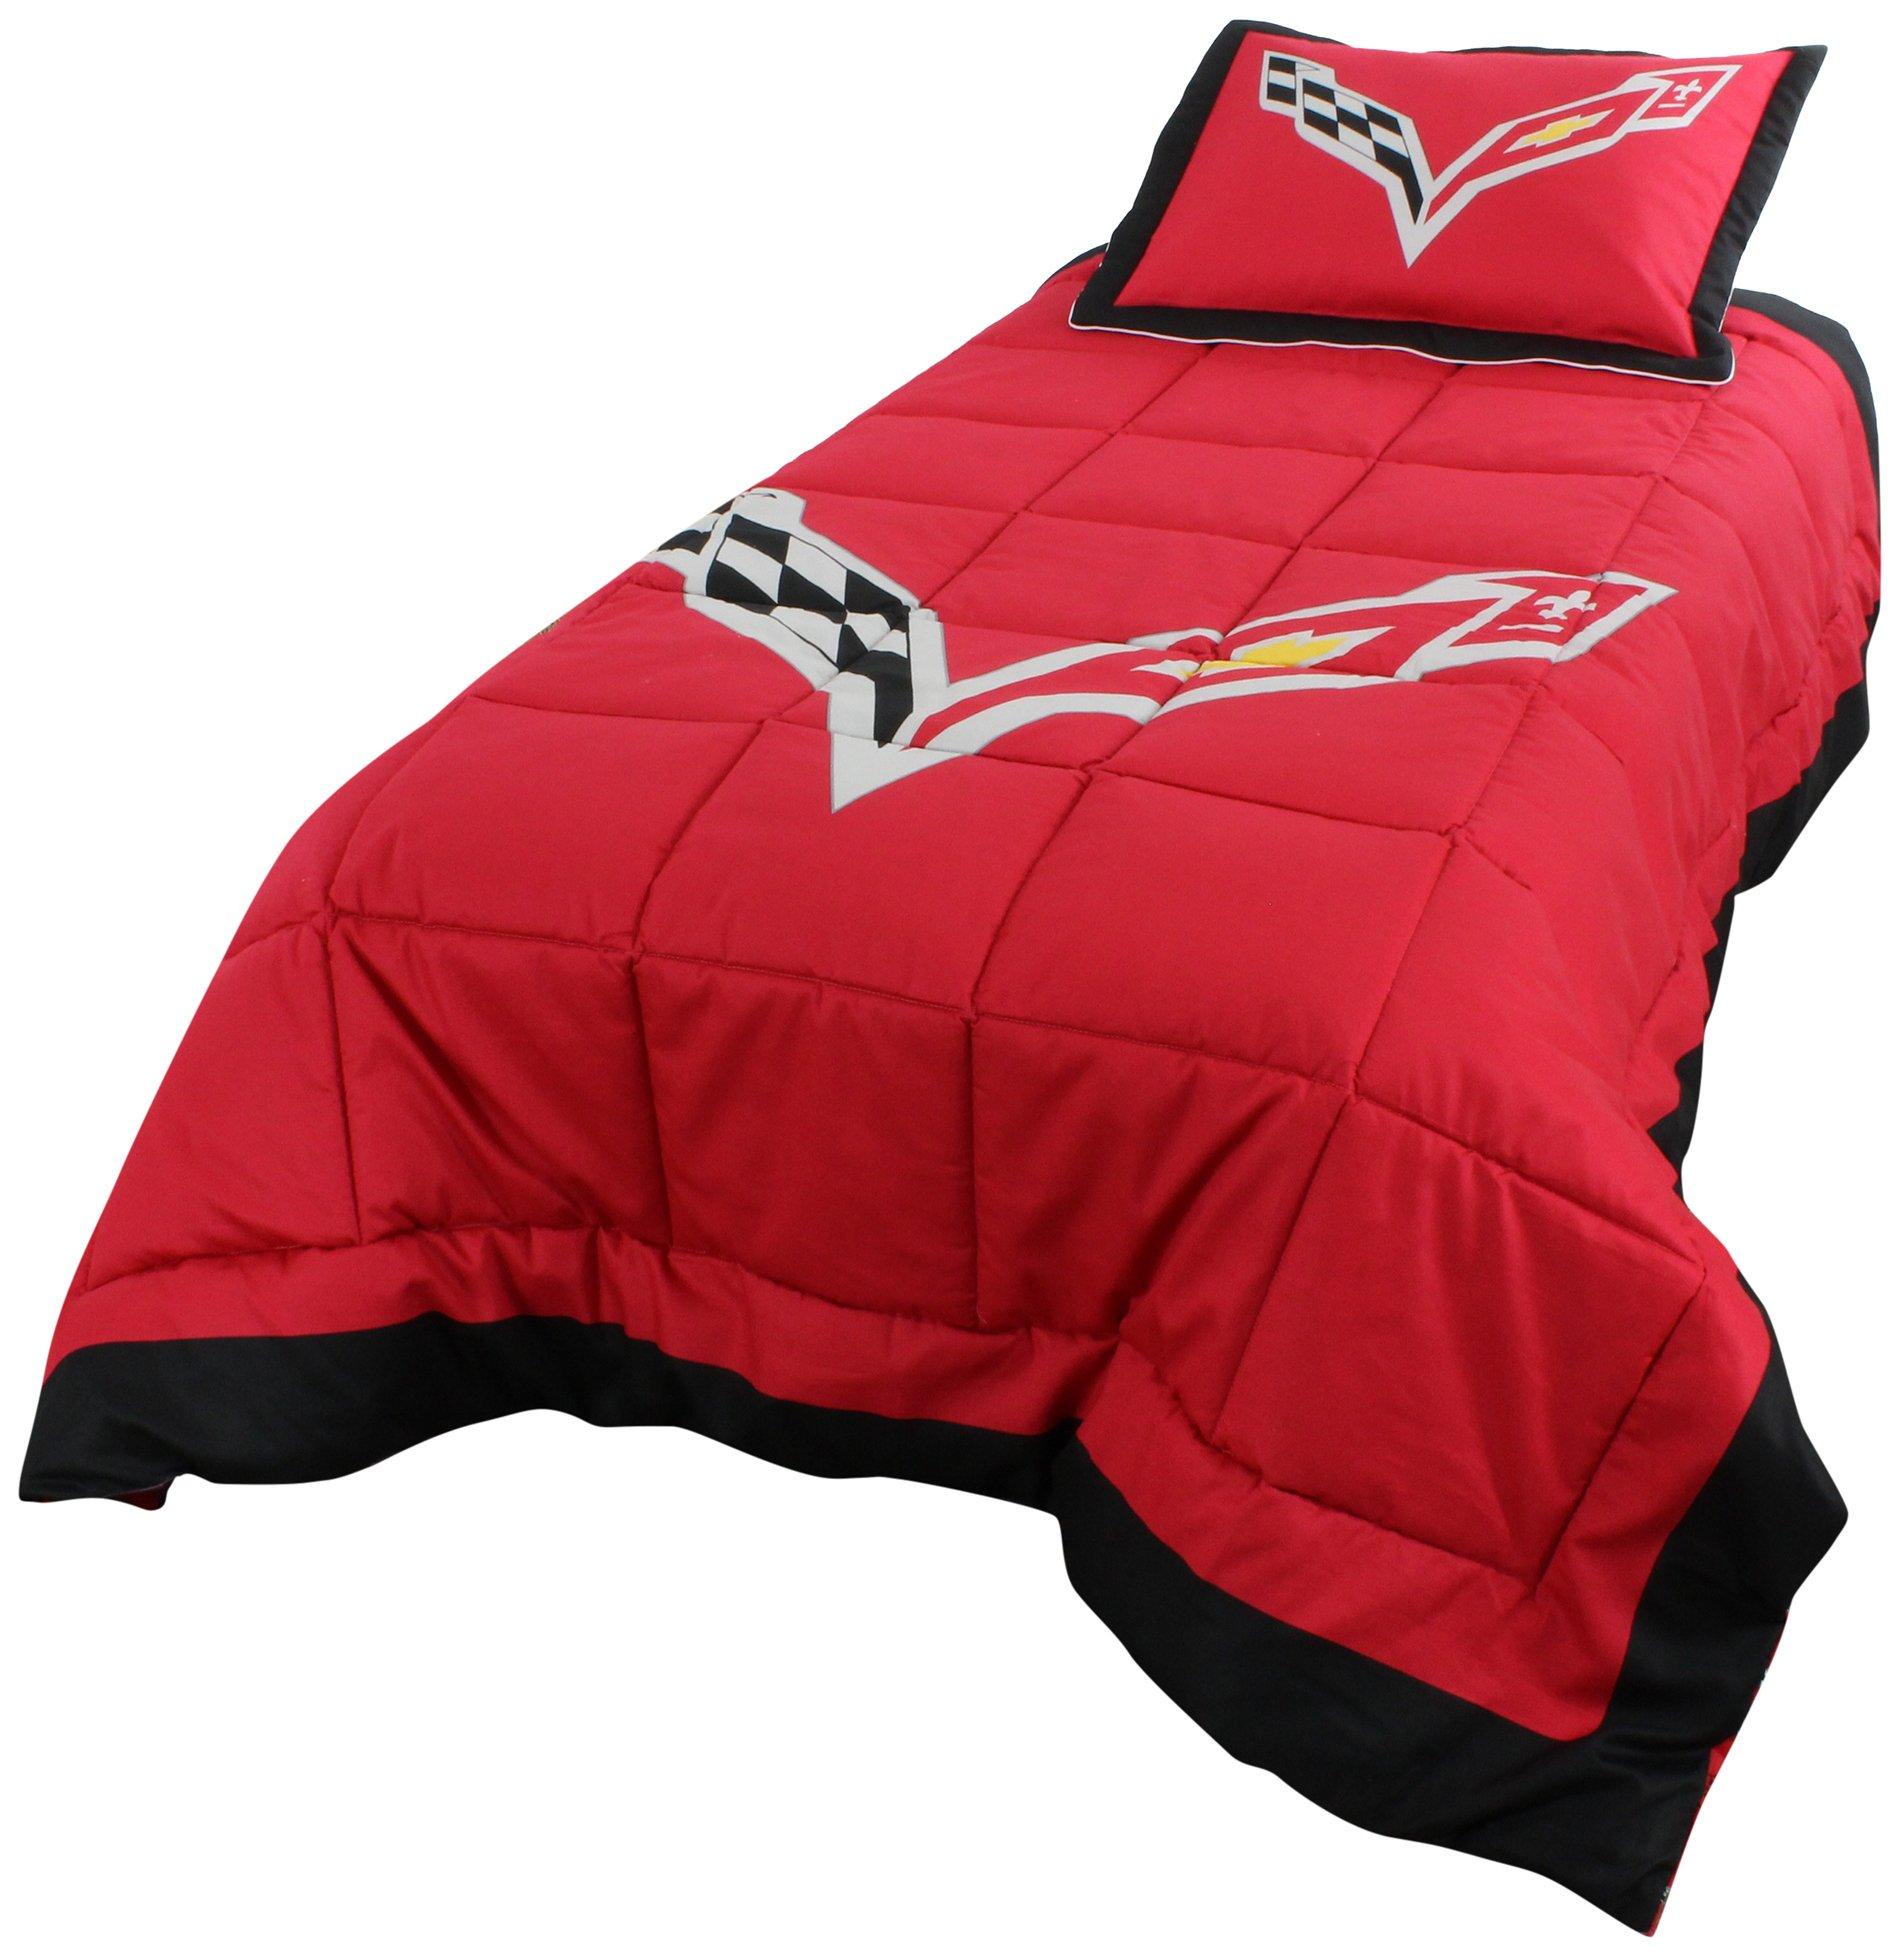 College Covers 2 Piece C7 2 Corvette Comforter Set, 68'' x 86''